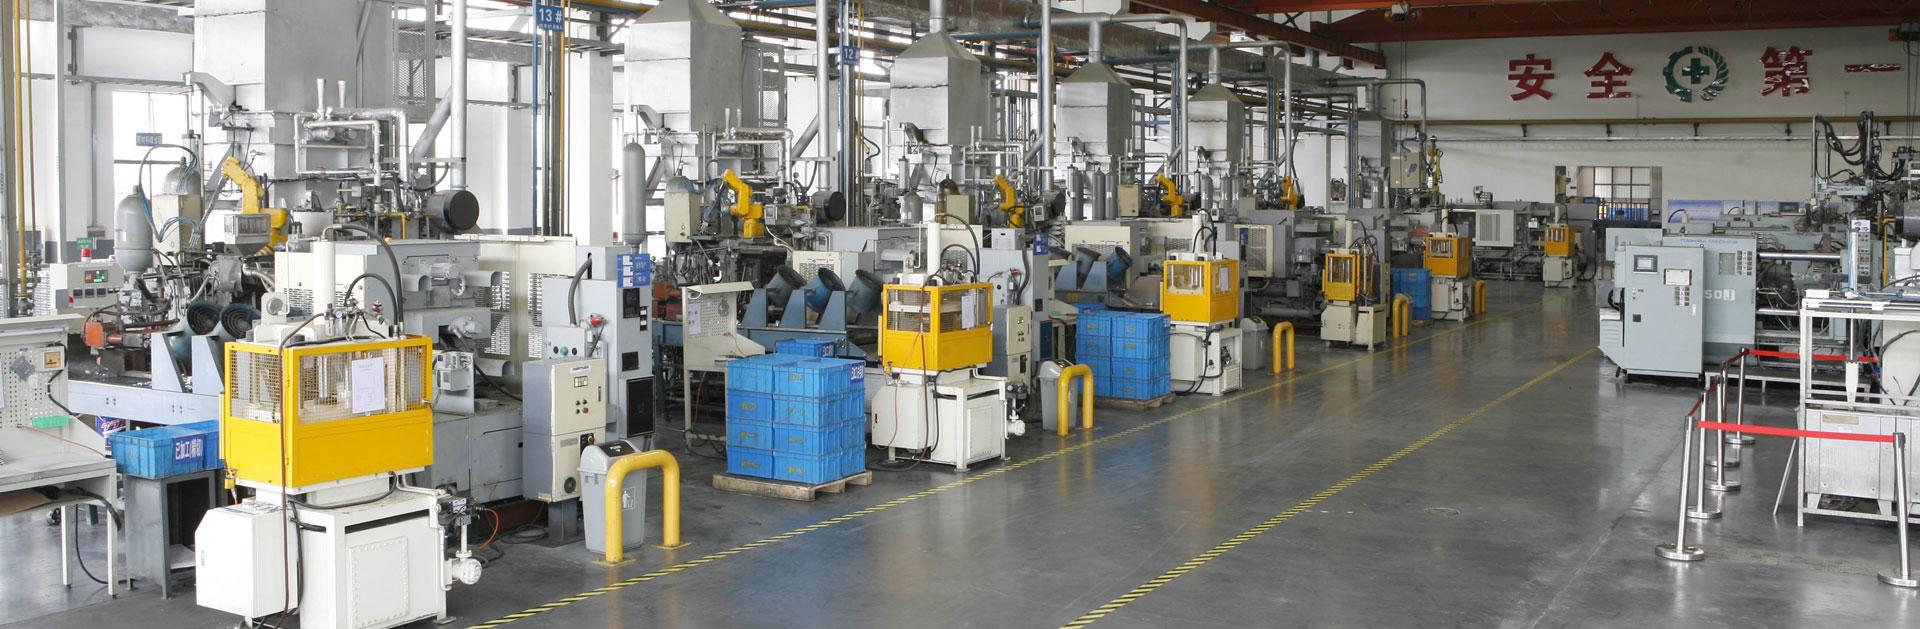 China Best Die Casting Parts - Metal Parts Case Studies